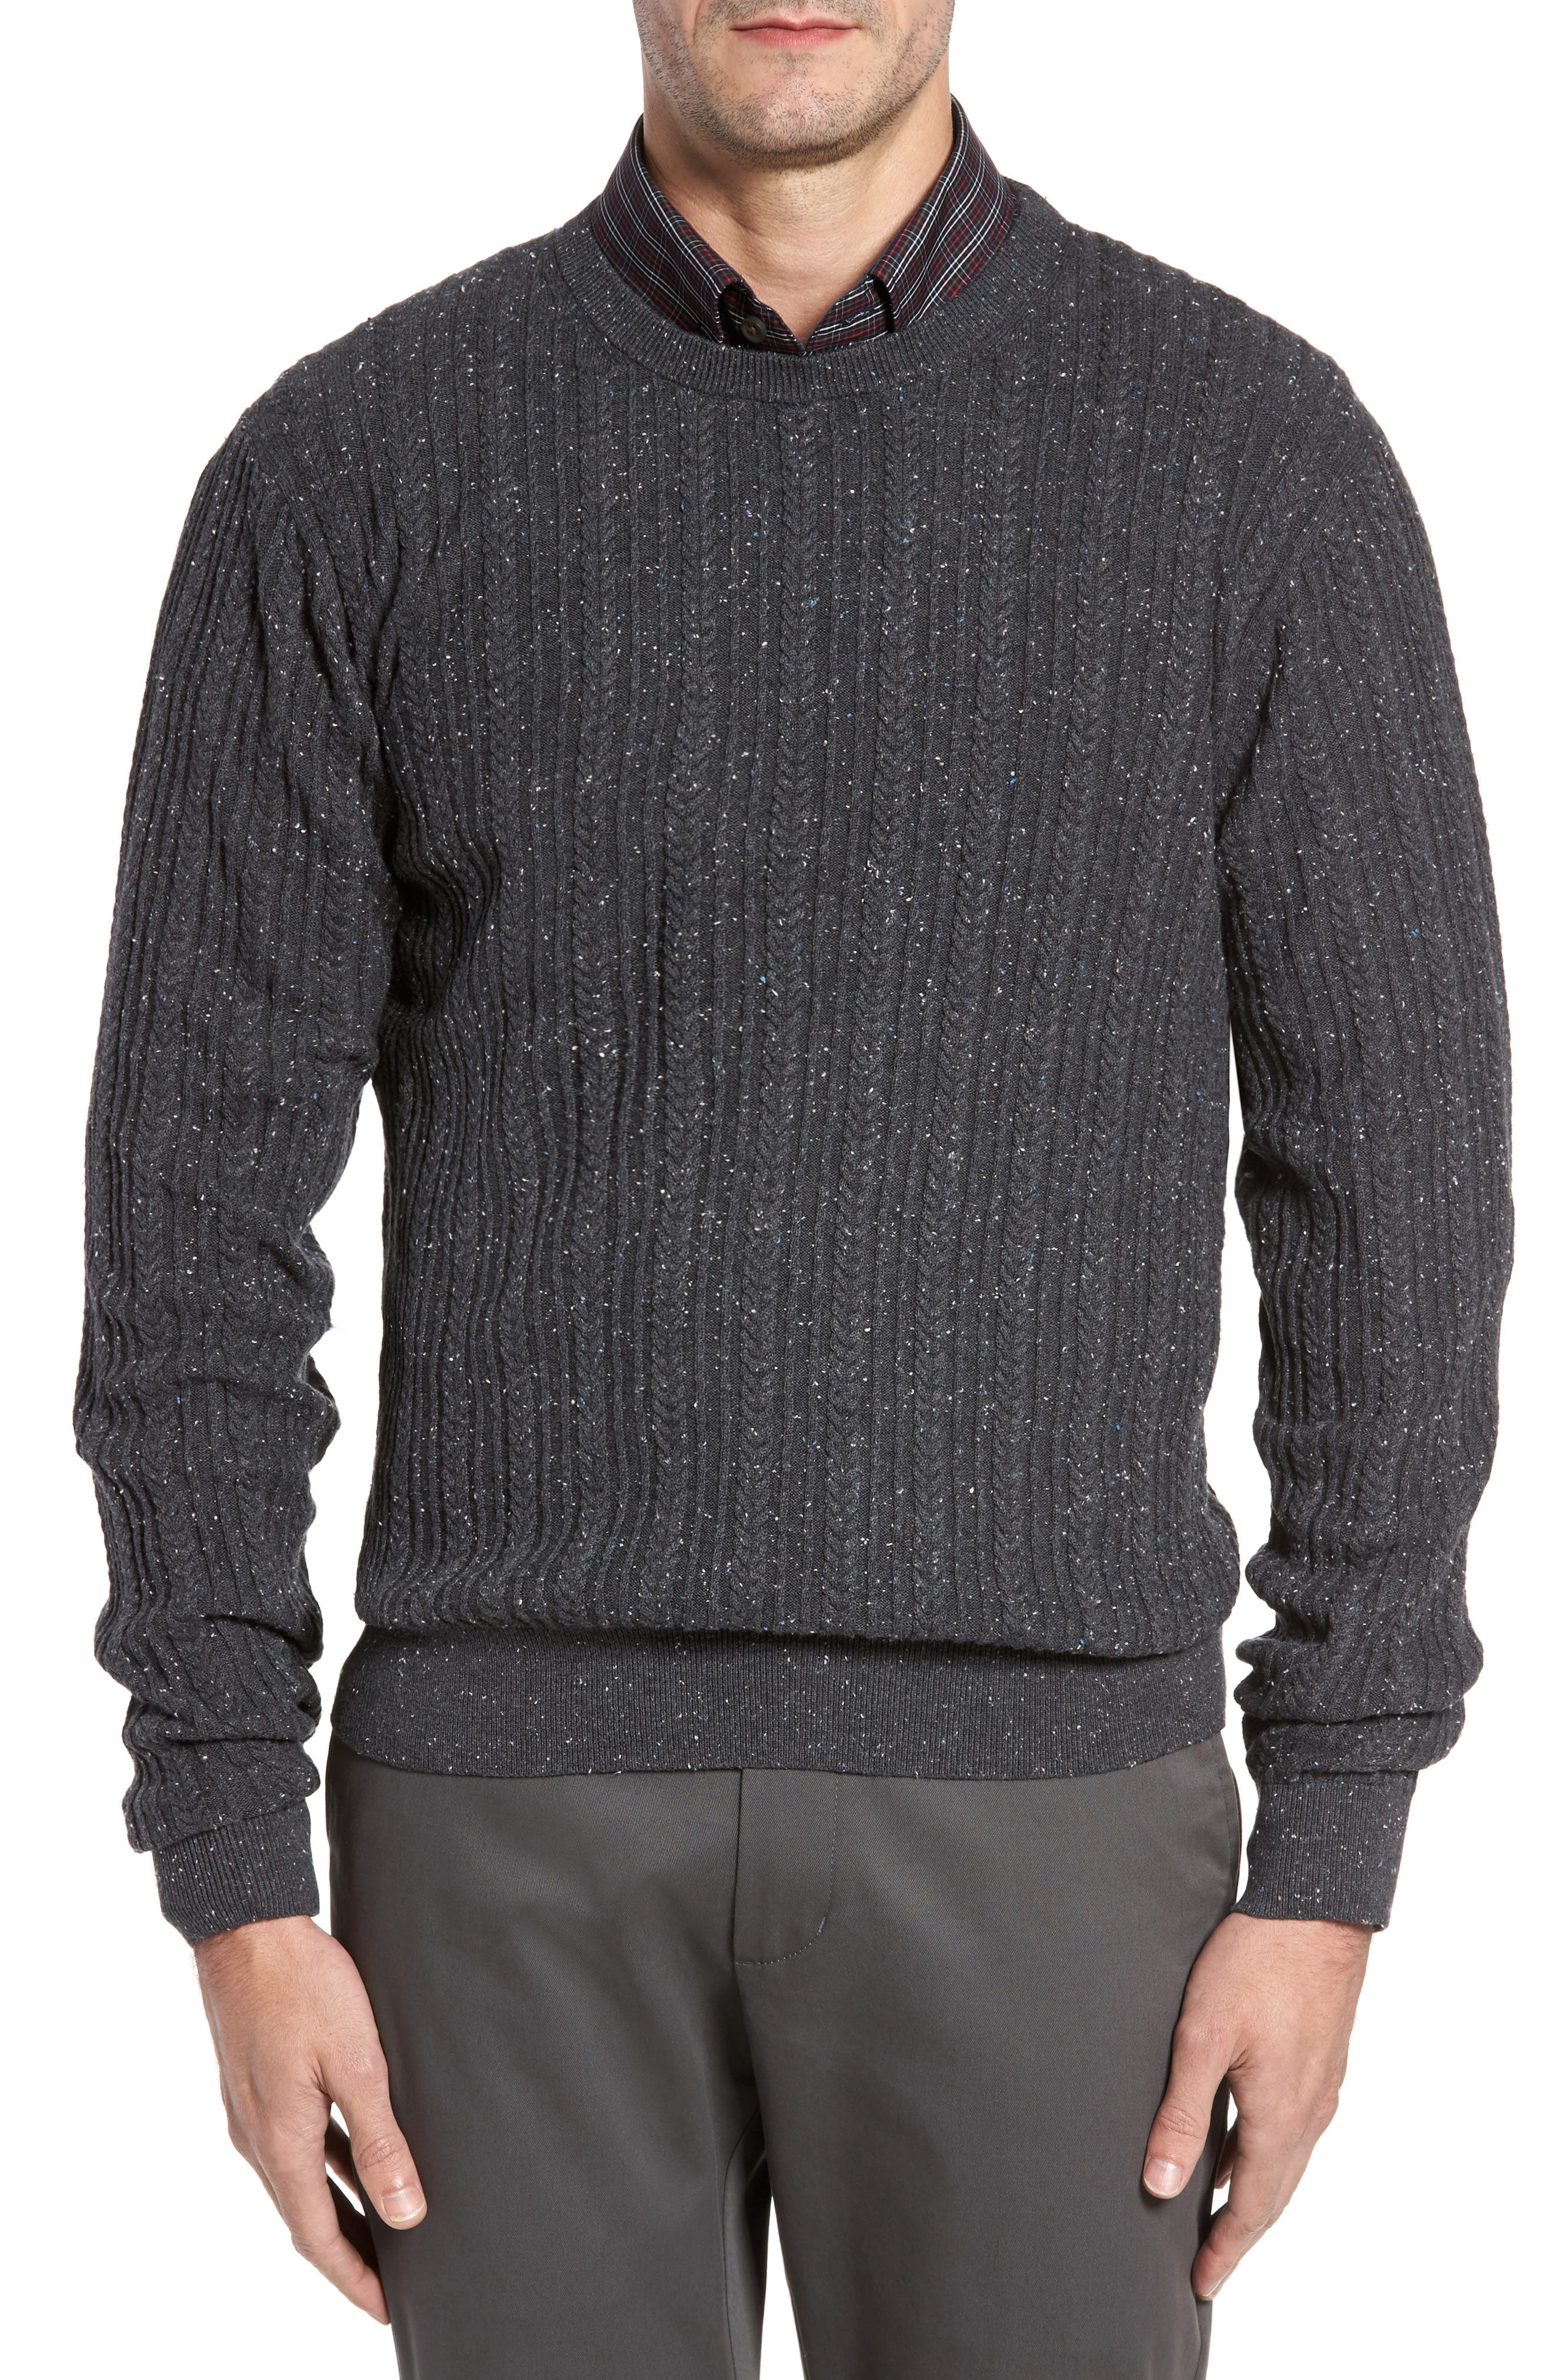 Carlton Crewneck Sweater,                             Main thumbnail 1, color,                             020